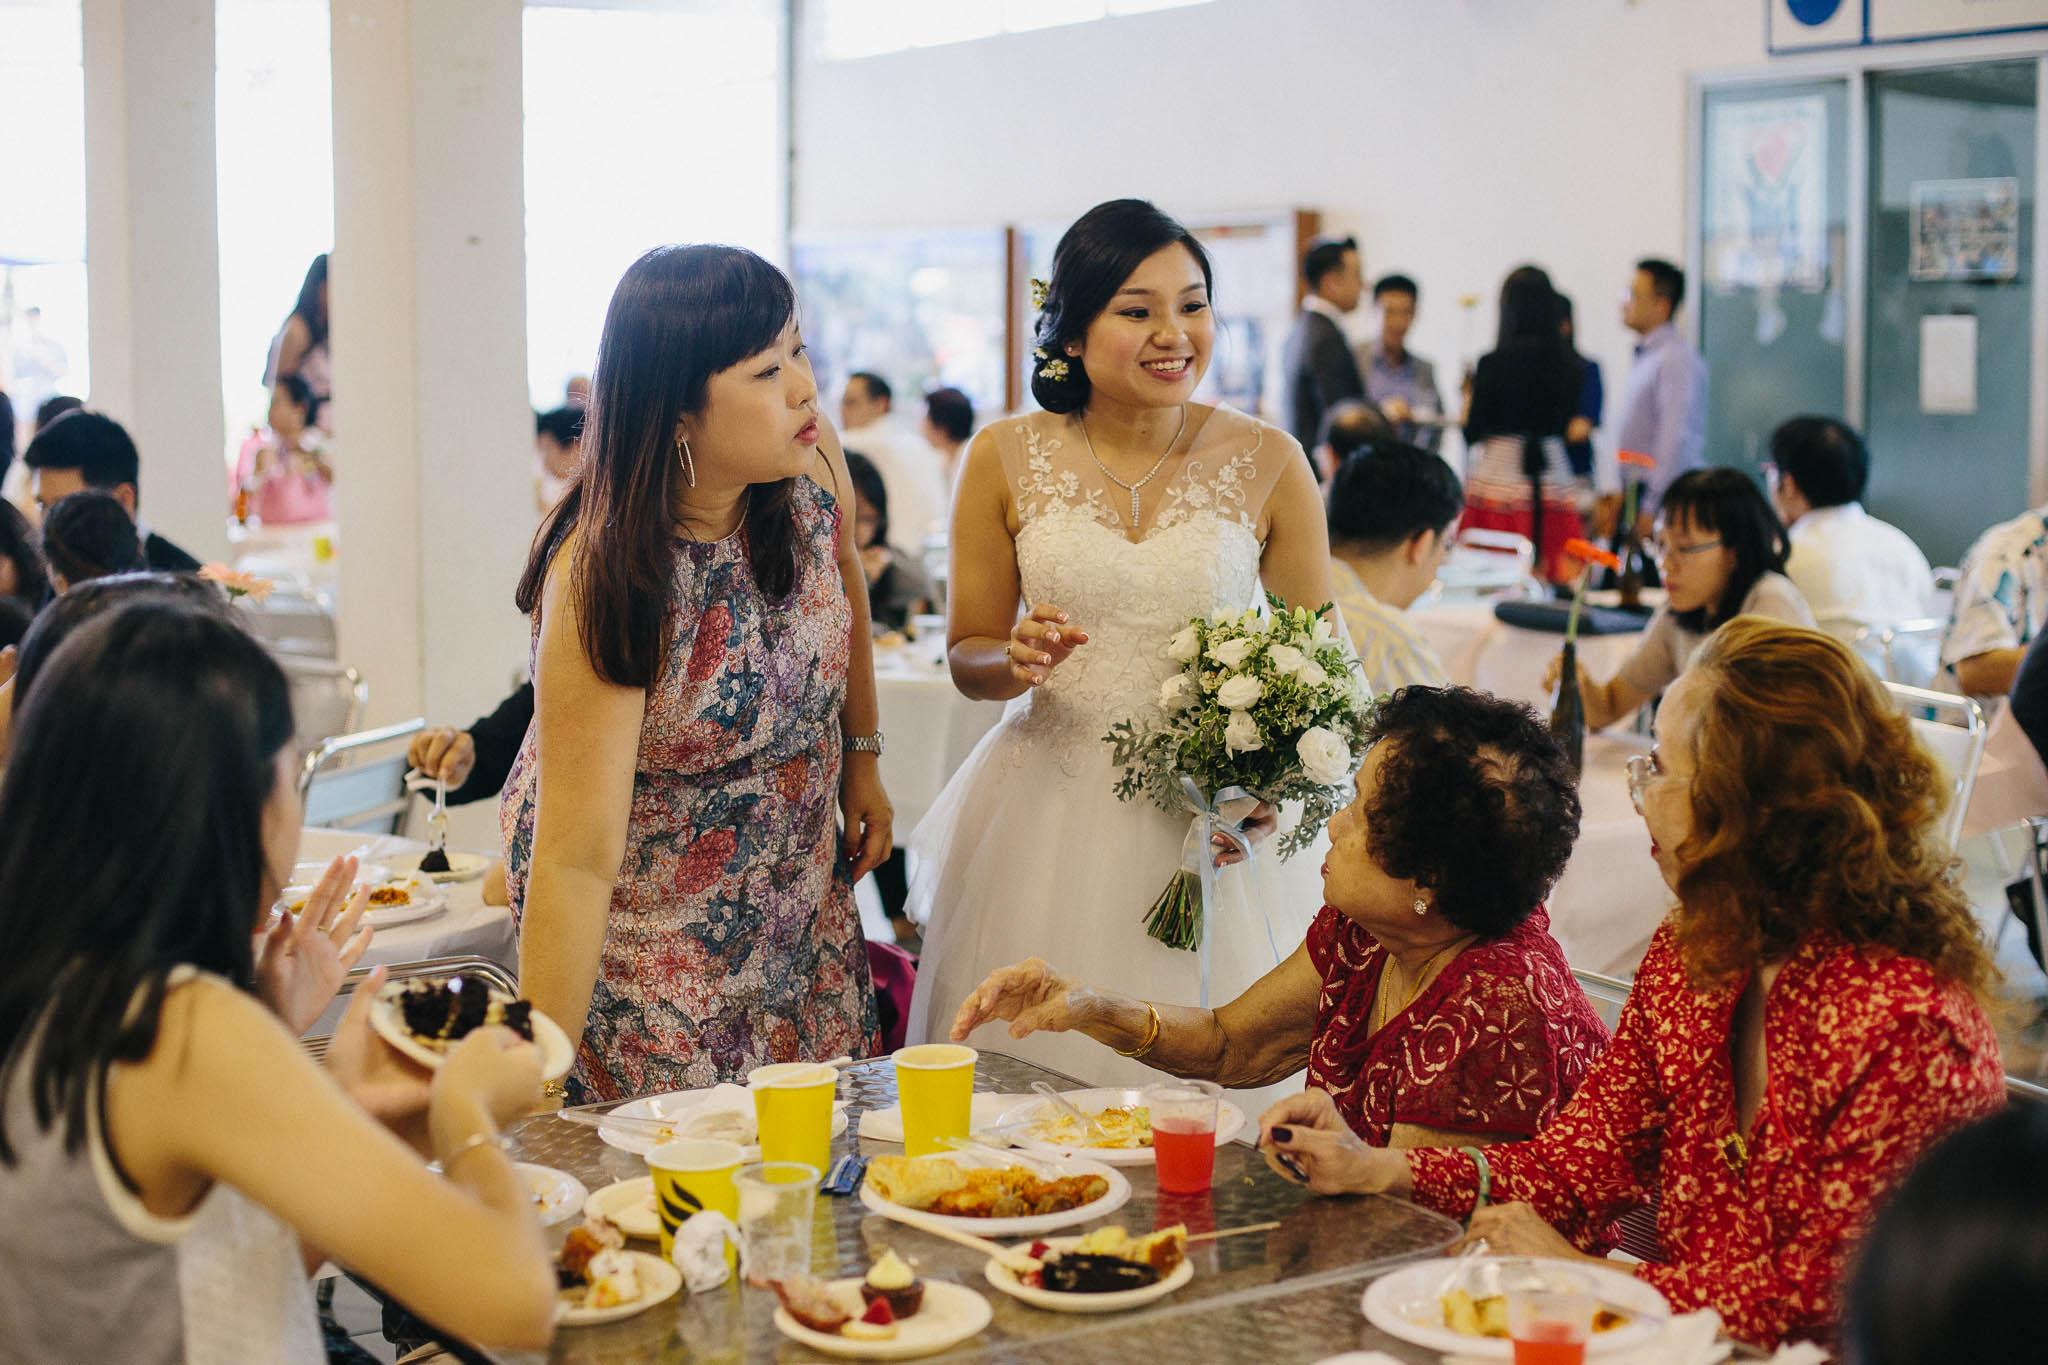 singapore-wedding-photographer-malay-indian-pre-wedding-travel-wmt-2015-jeremy-larissa-58.jpg